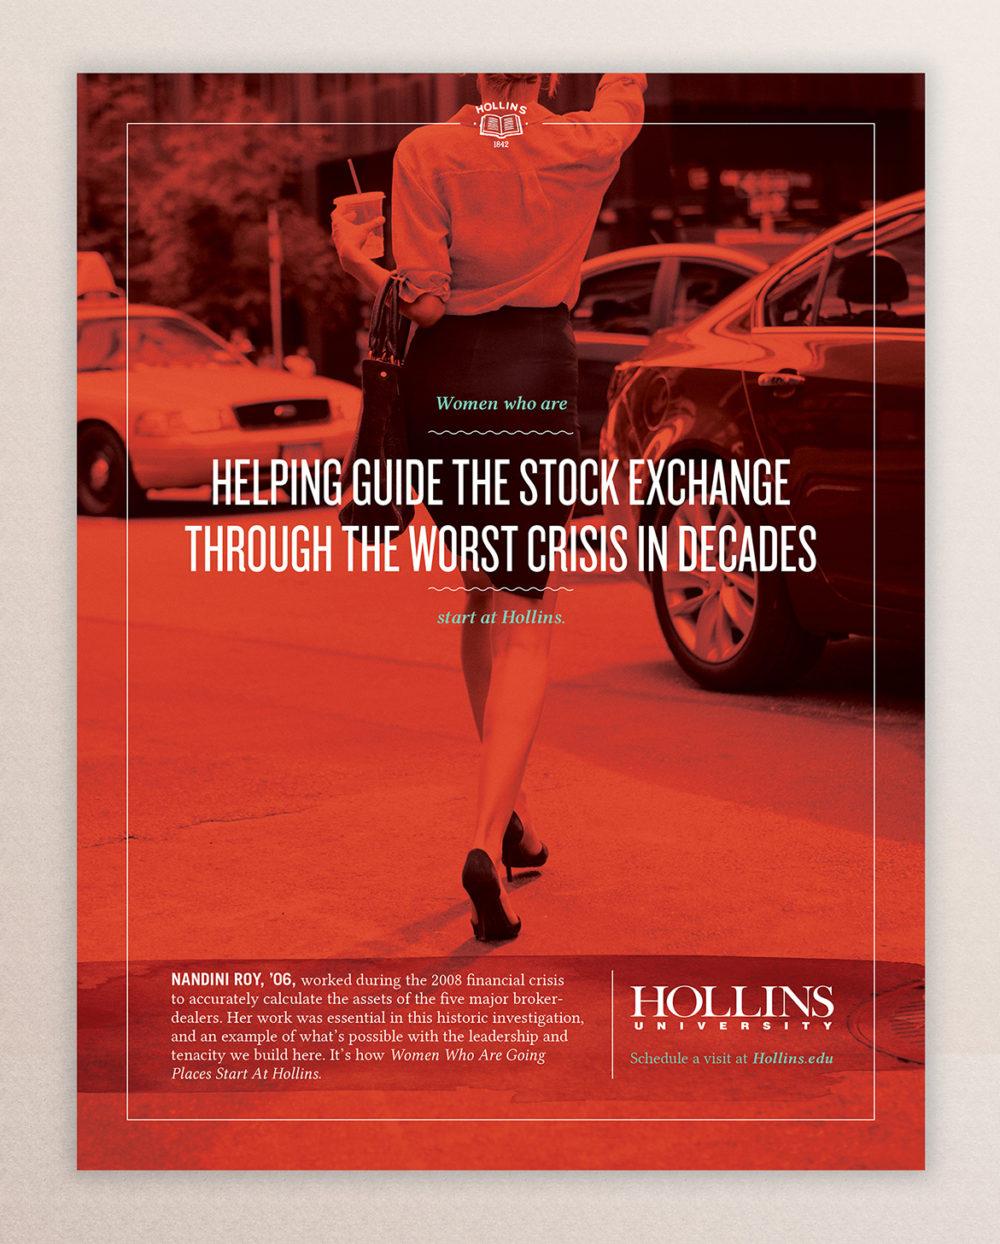 Hollins Print Ads – 1